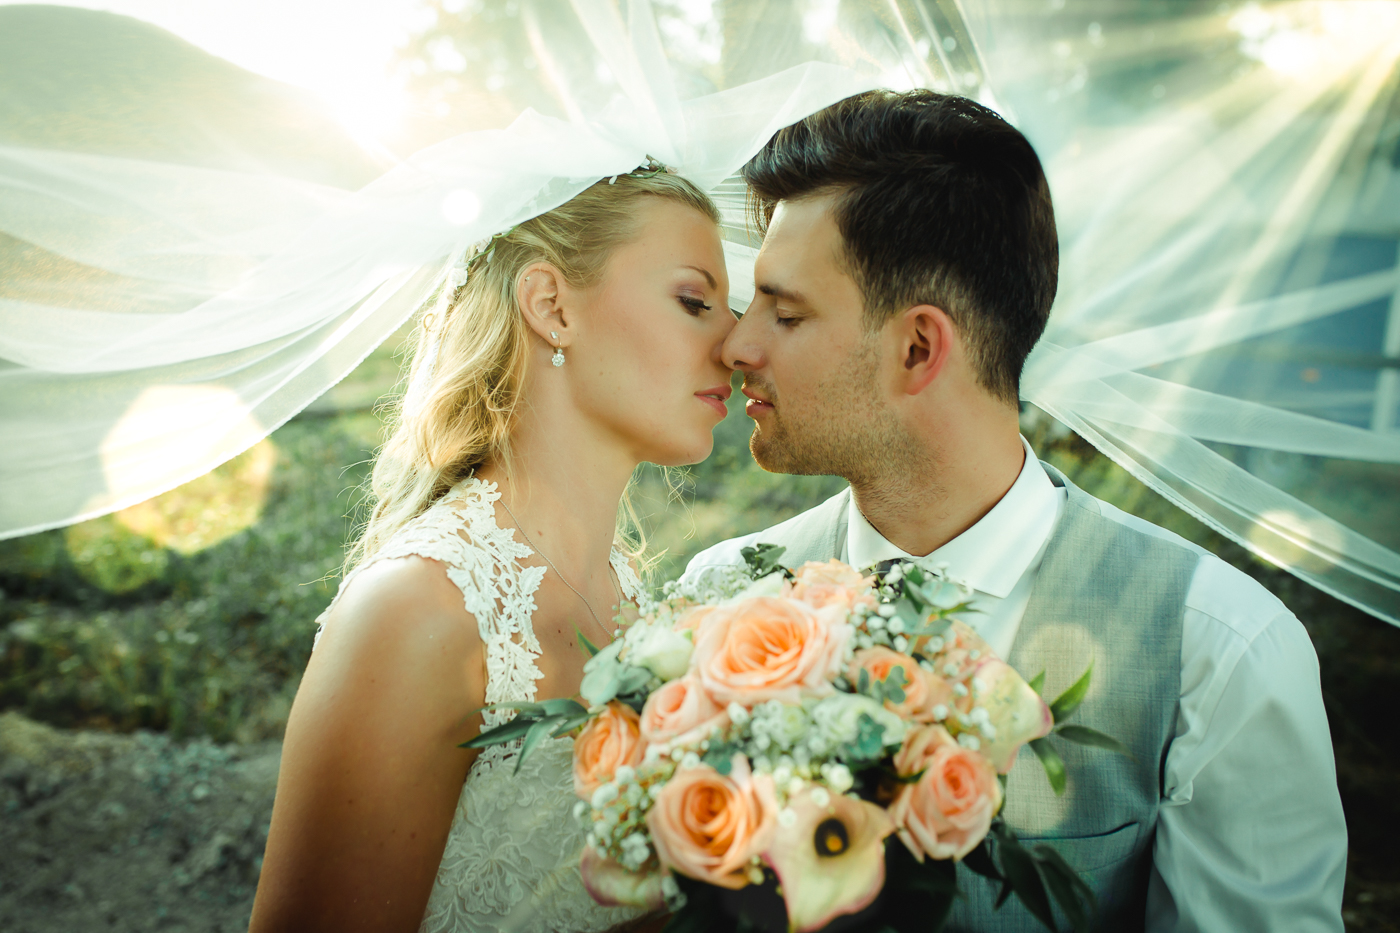 Brautpaarshooting fotografiert vom Wiener Fotografen Markus Winkelbauer